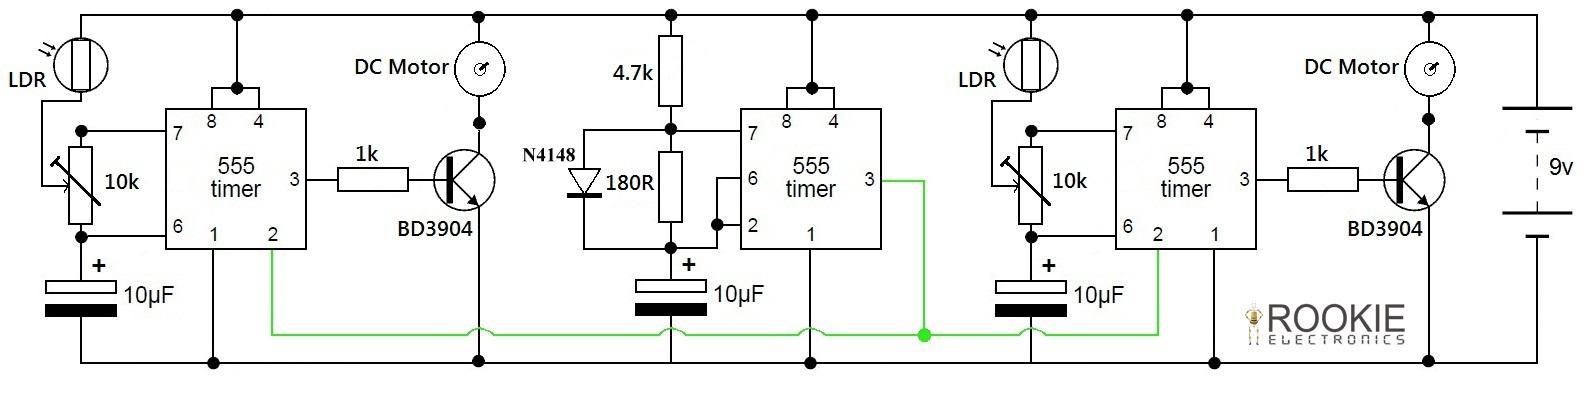 Sikv Light Seeking Robot Bb furthermore Logic Advance Line Follower further Lfr Using Timers also L N Ile V Volt  er Guc Kaynagi Usmernik V A Ms Dpi further Arduino Line Follower Robot Circuit. on line following robot circuit diagram